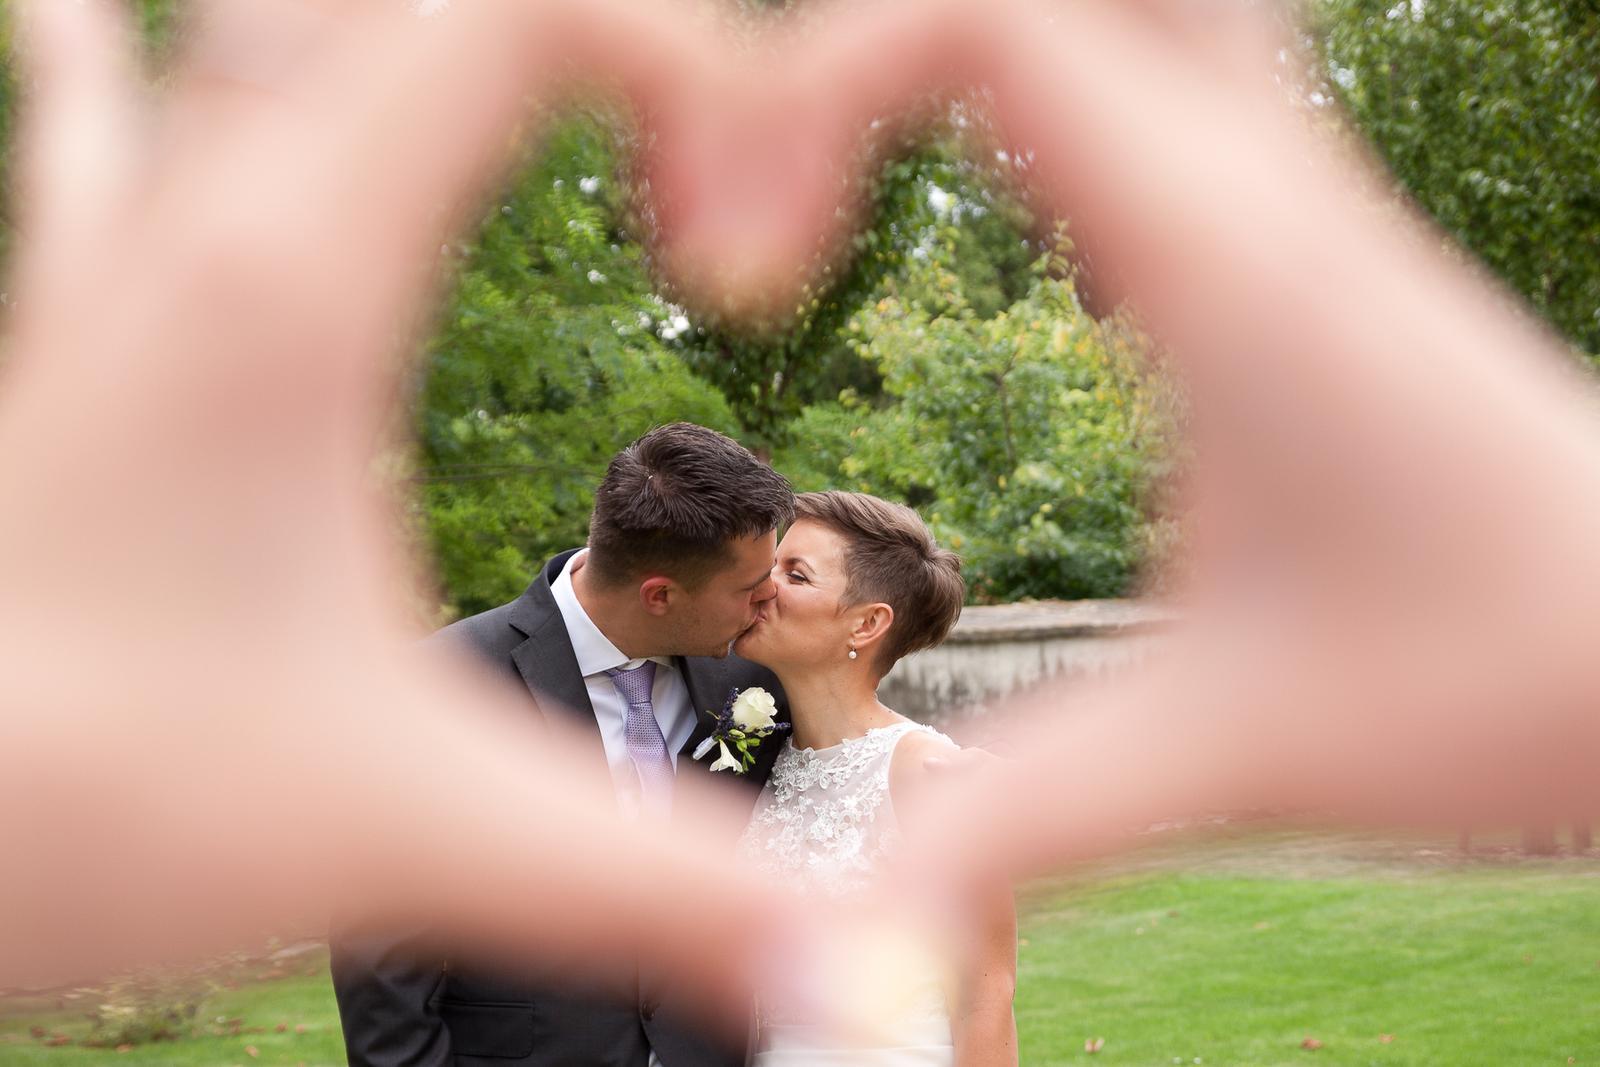 Svatba Zámek Benátky nad Jizerou - Obrázek č. 7